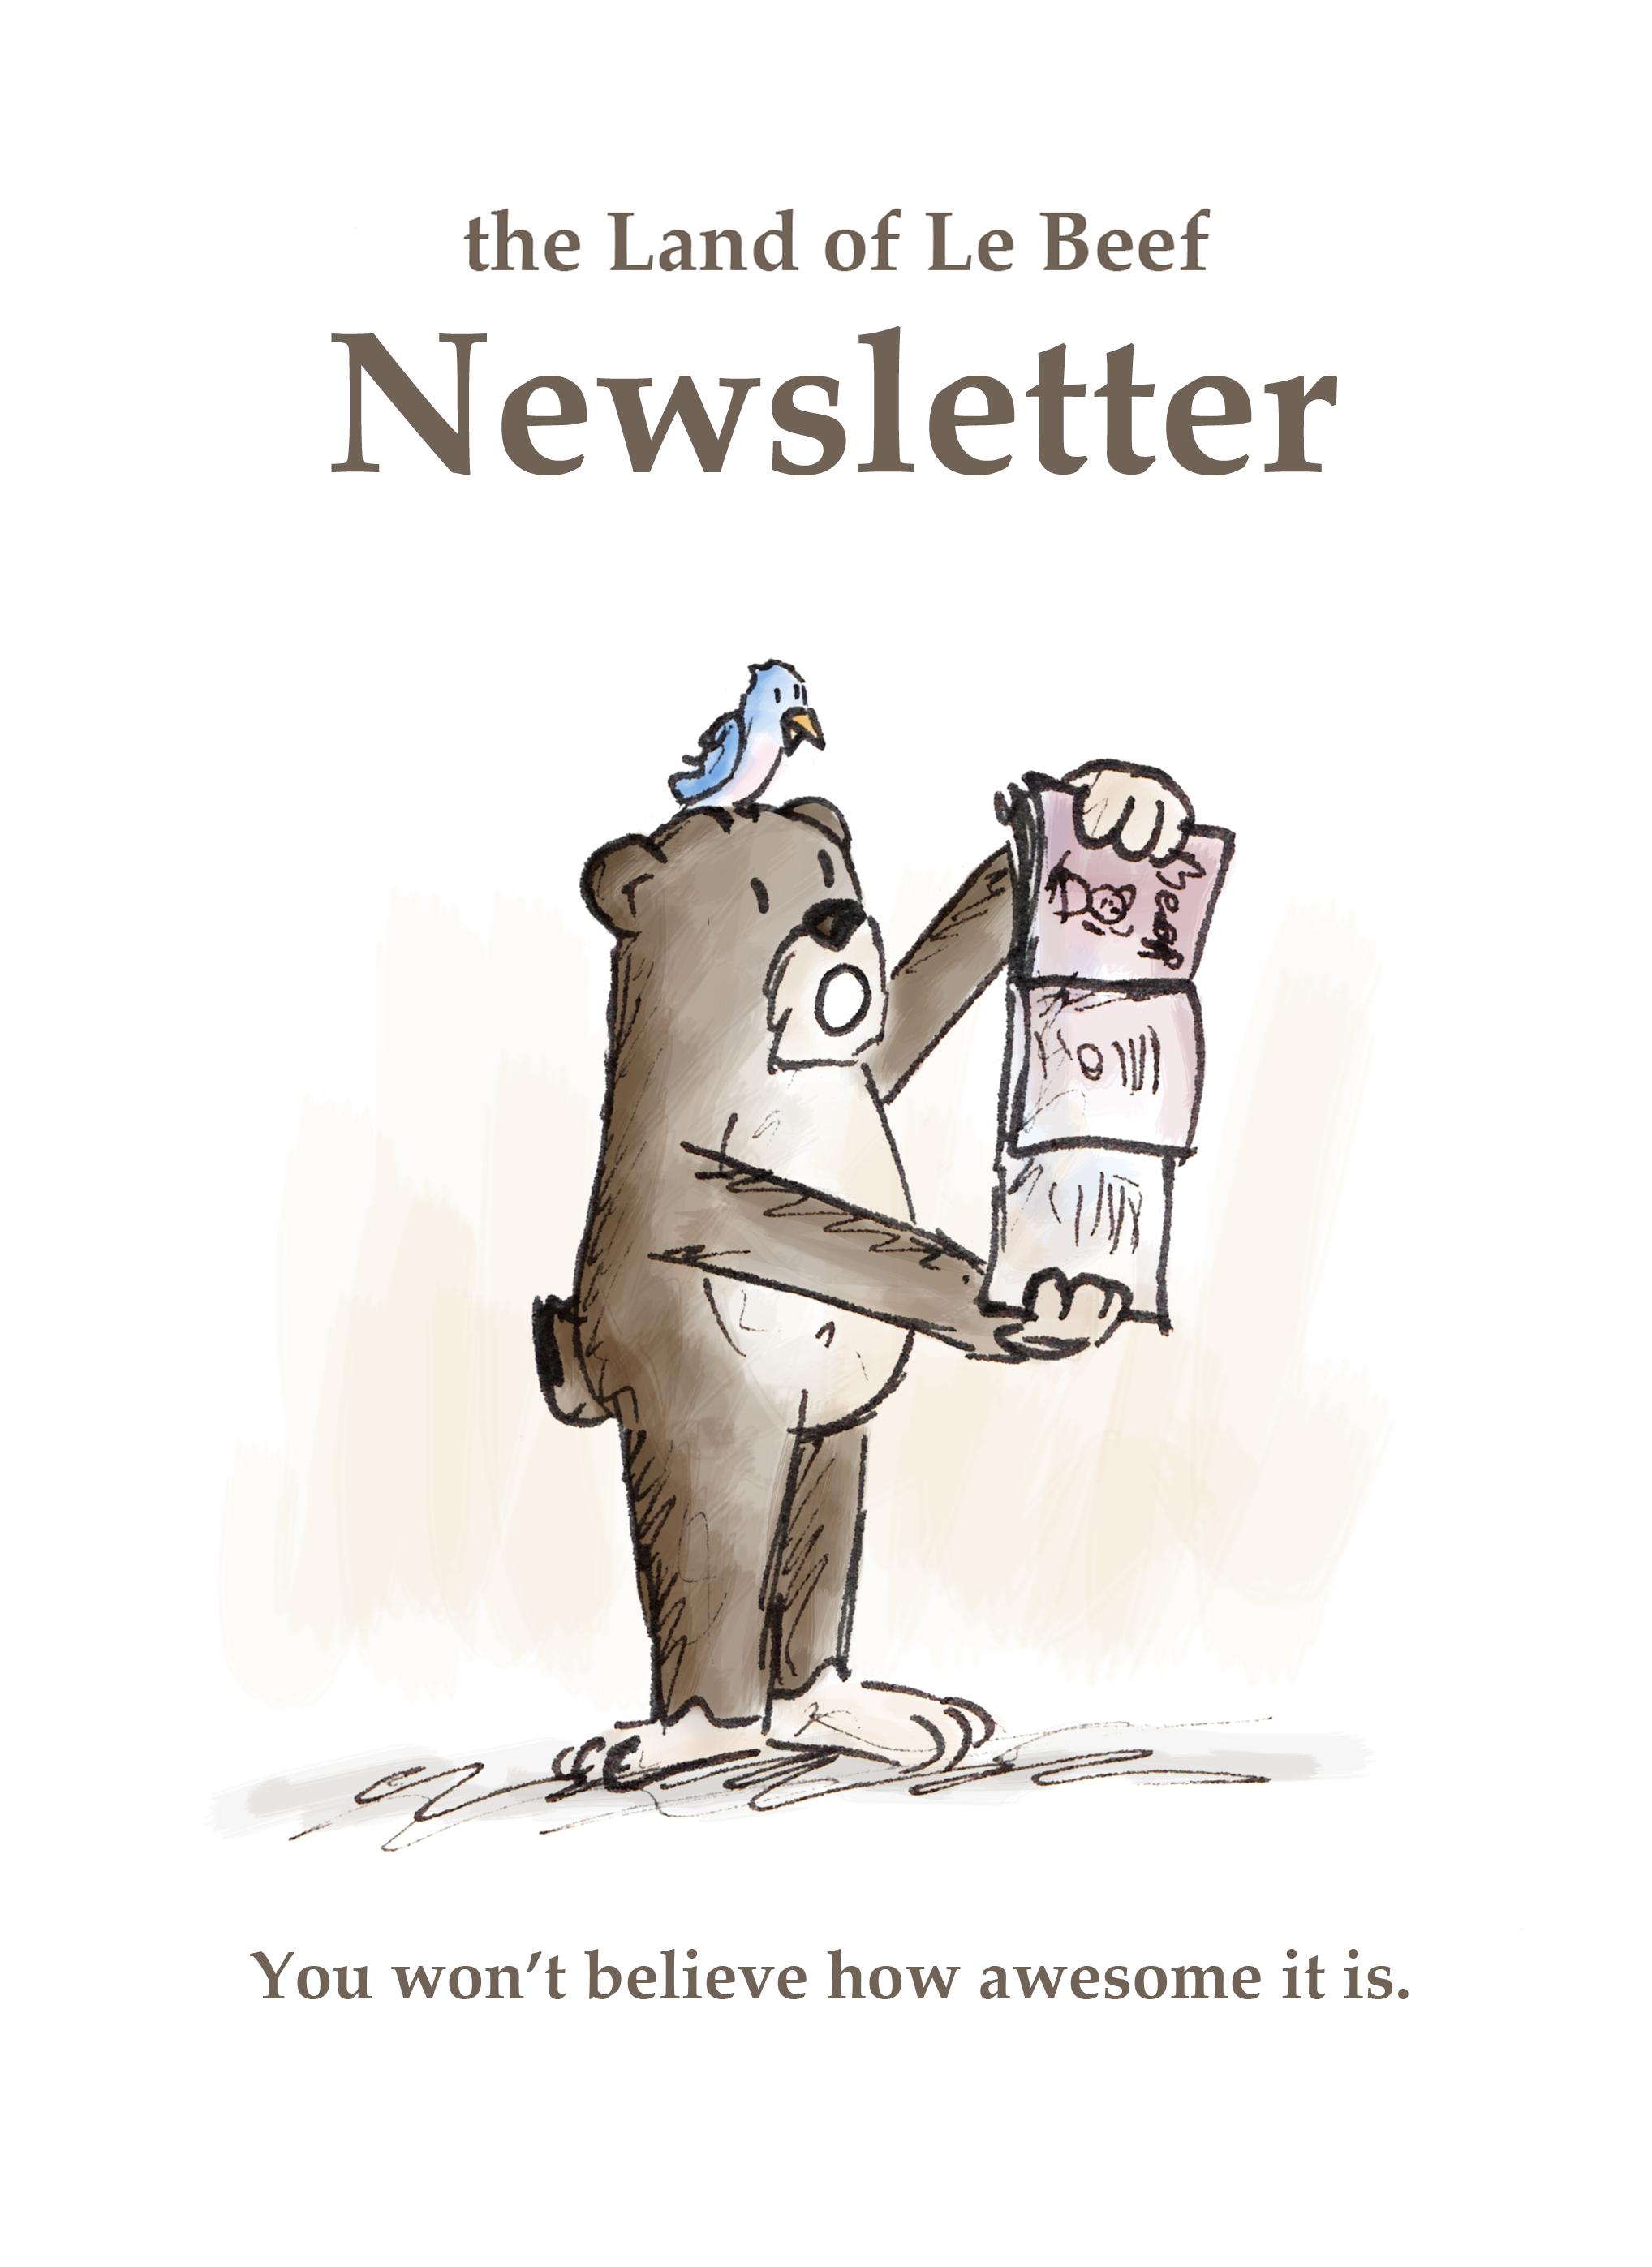 Beef_Newsletter_01b.jpg